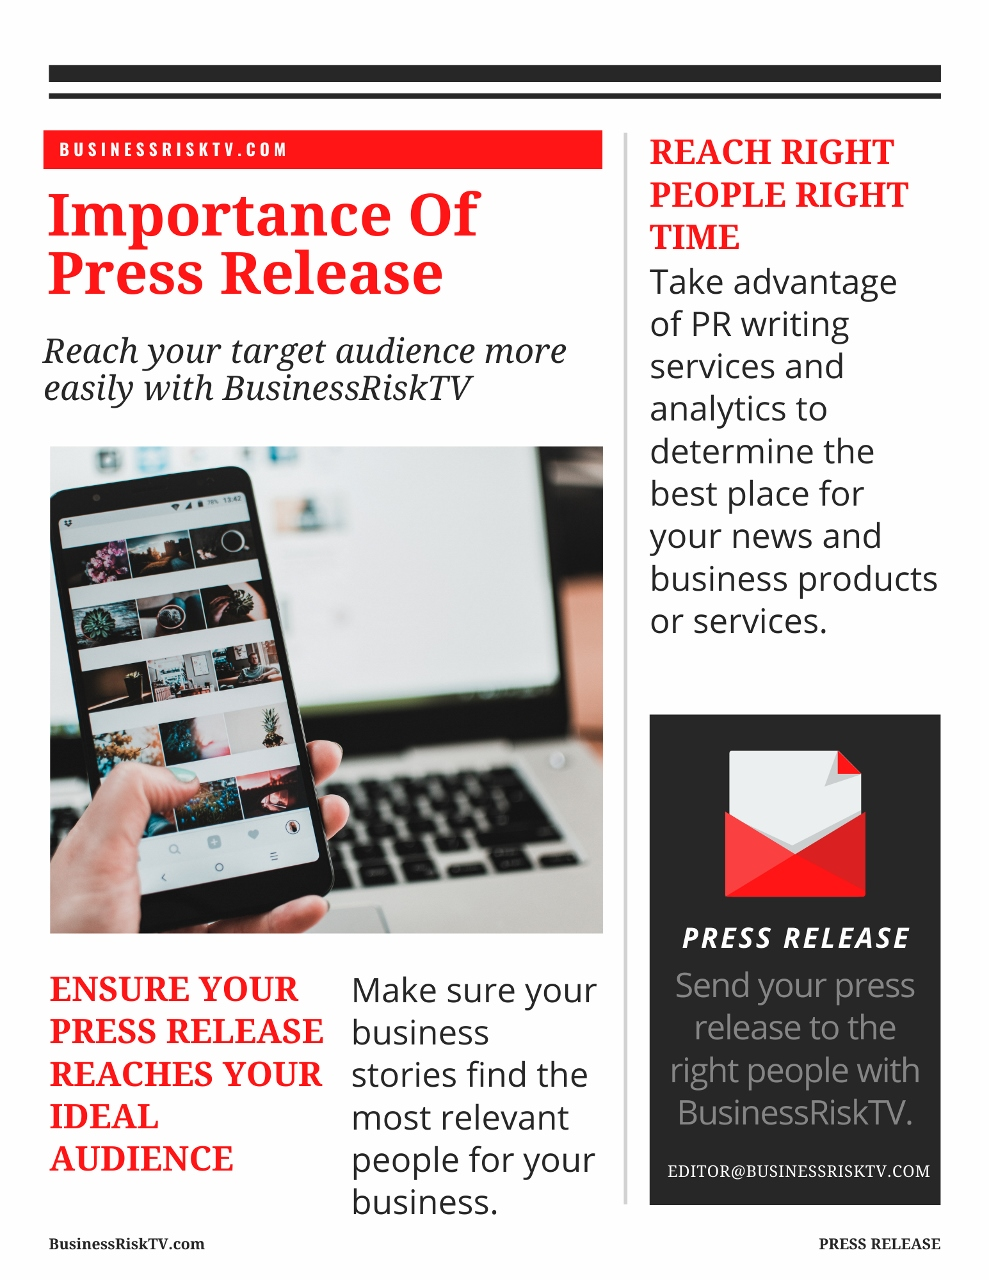 Business Press Release Service